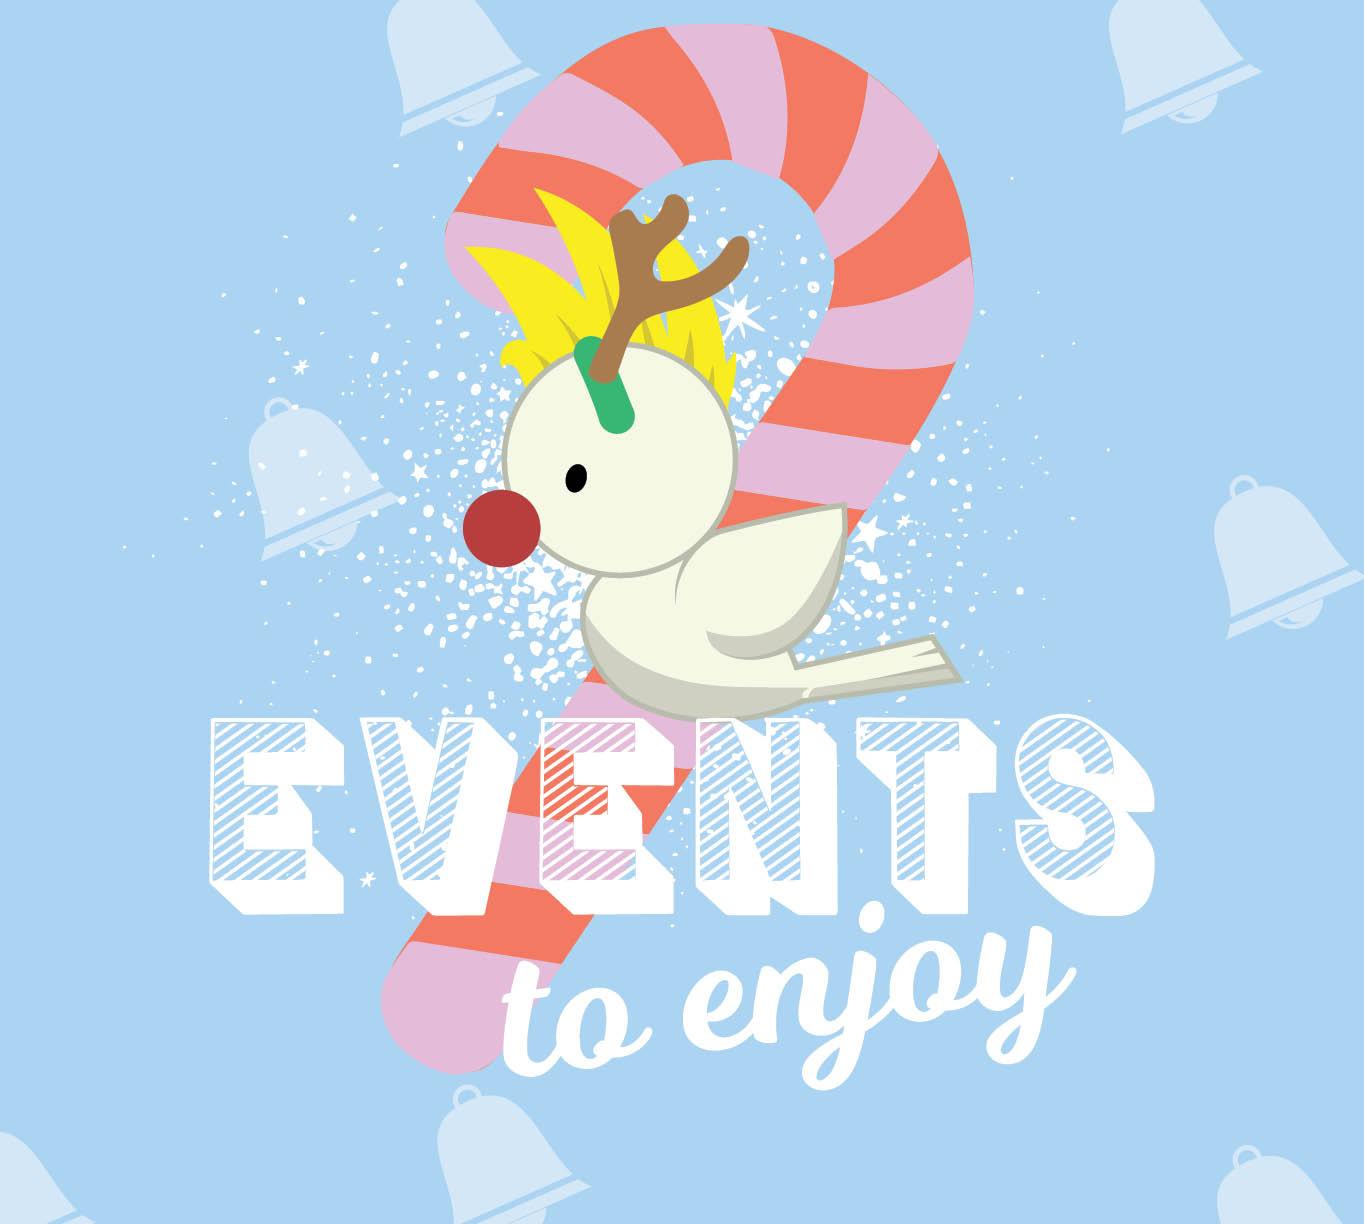 CH4806_Xmas 2019_Web Tiles_Events to enjoy_2_628x612px